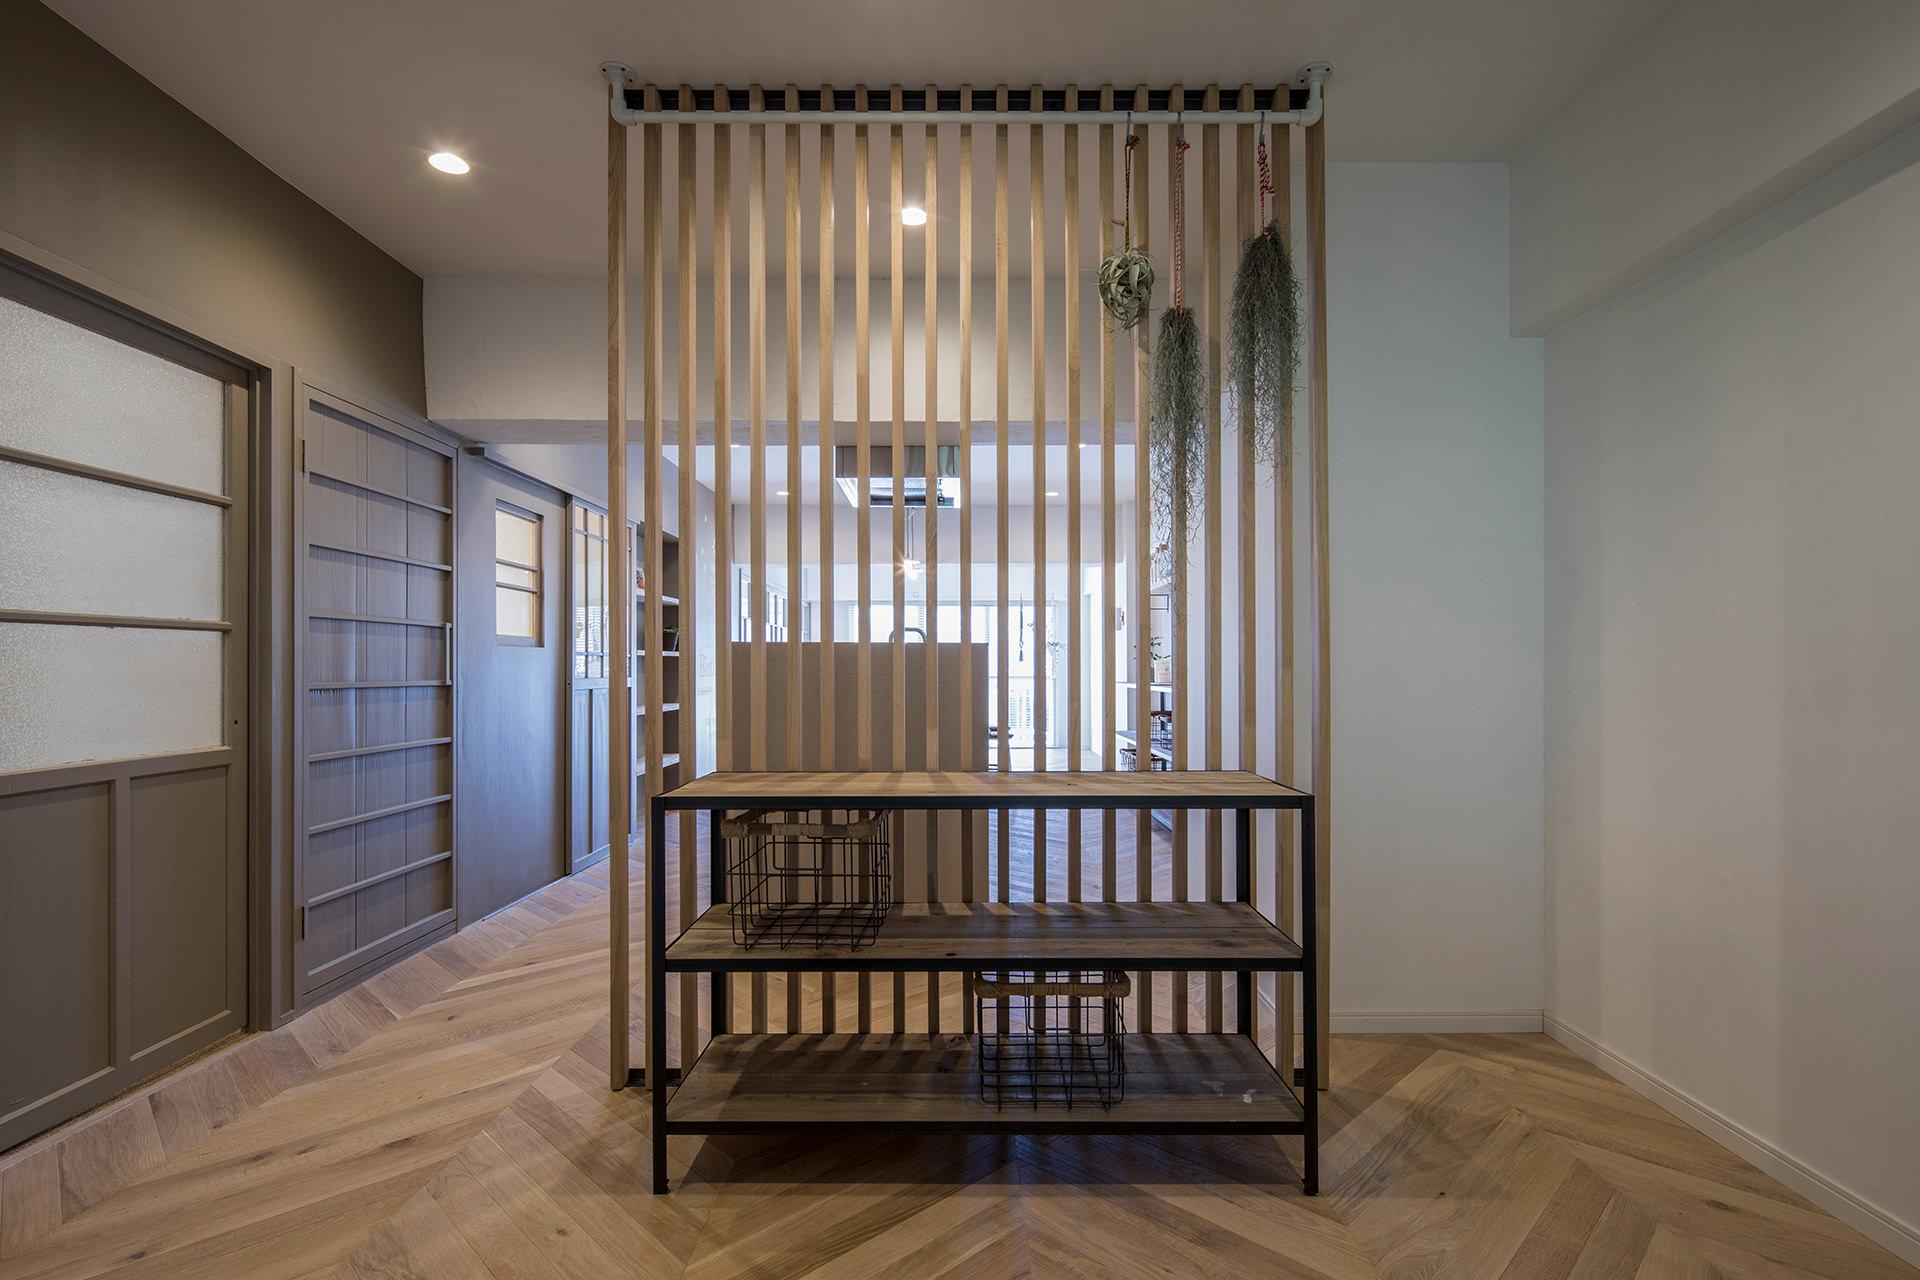 stri-ep house* flat 葉山エコーハイツ  イメージ1 撮影:東涌写真事務所・東涌宏和